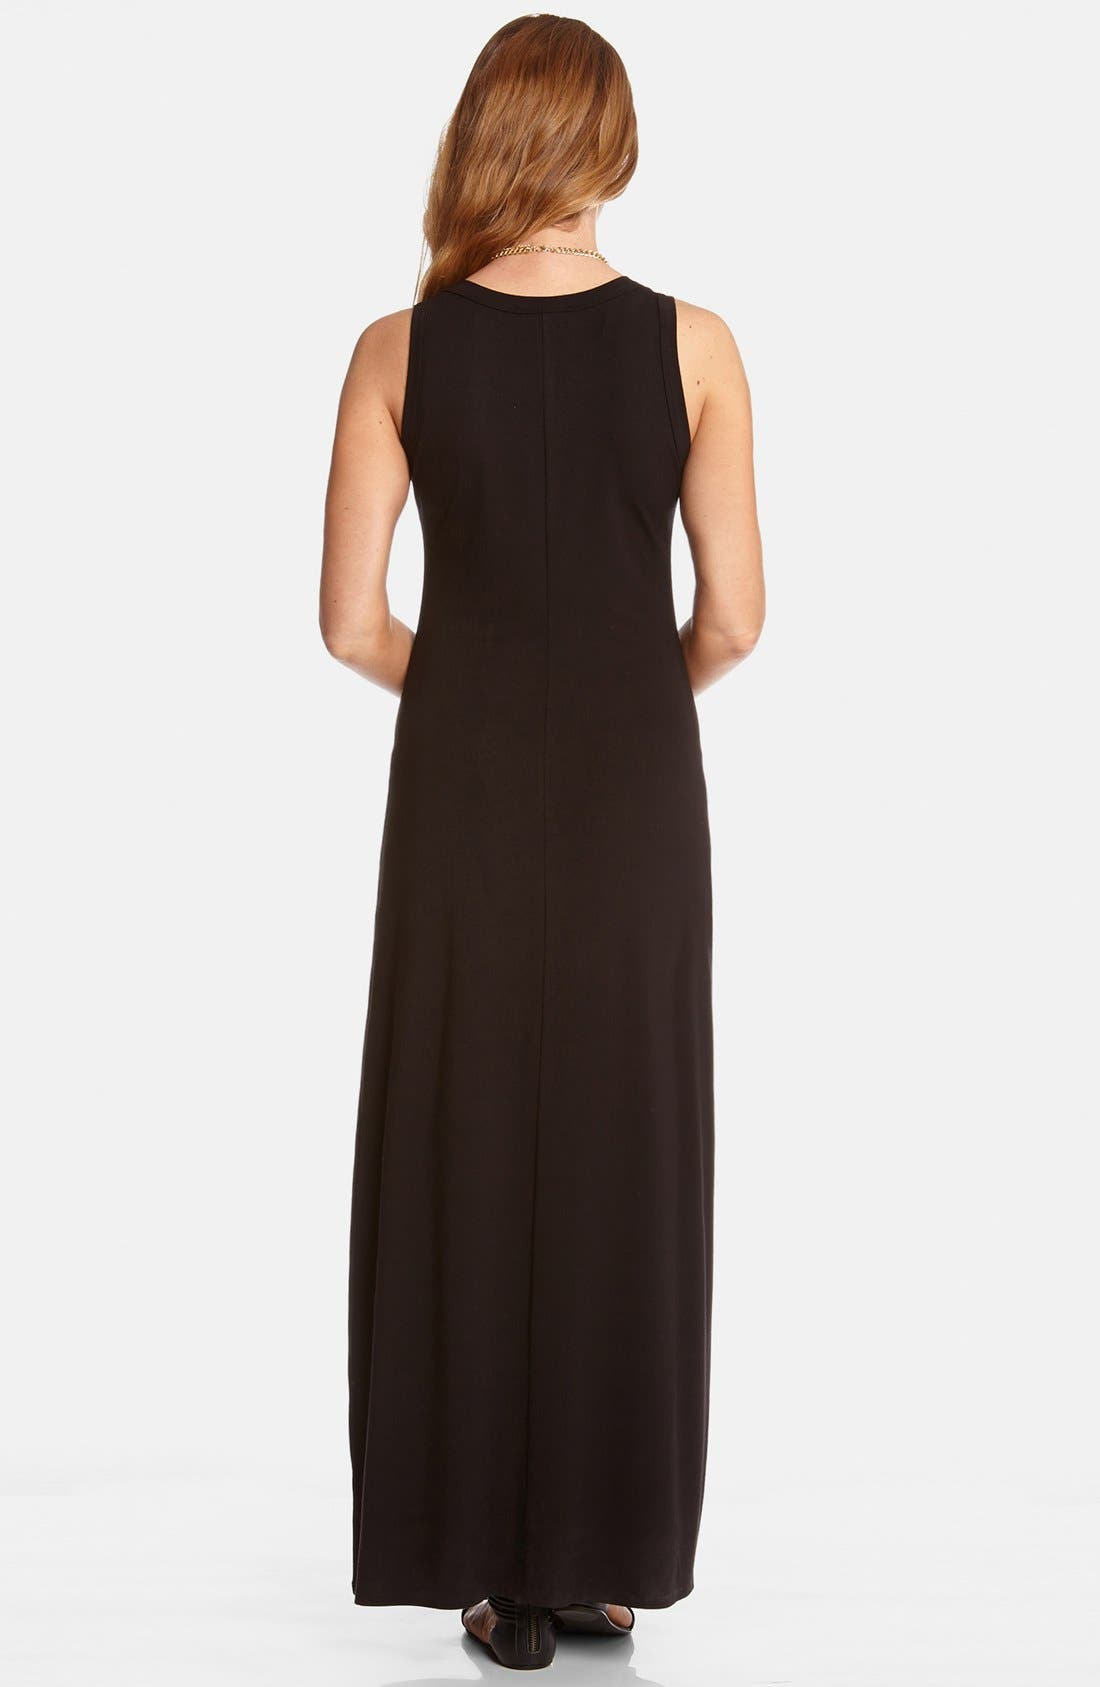 KAREN KANE, Maxi Tank Dress, Alternate thumbnail 4, color, BLACK